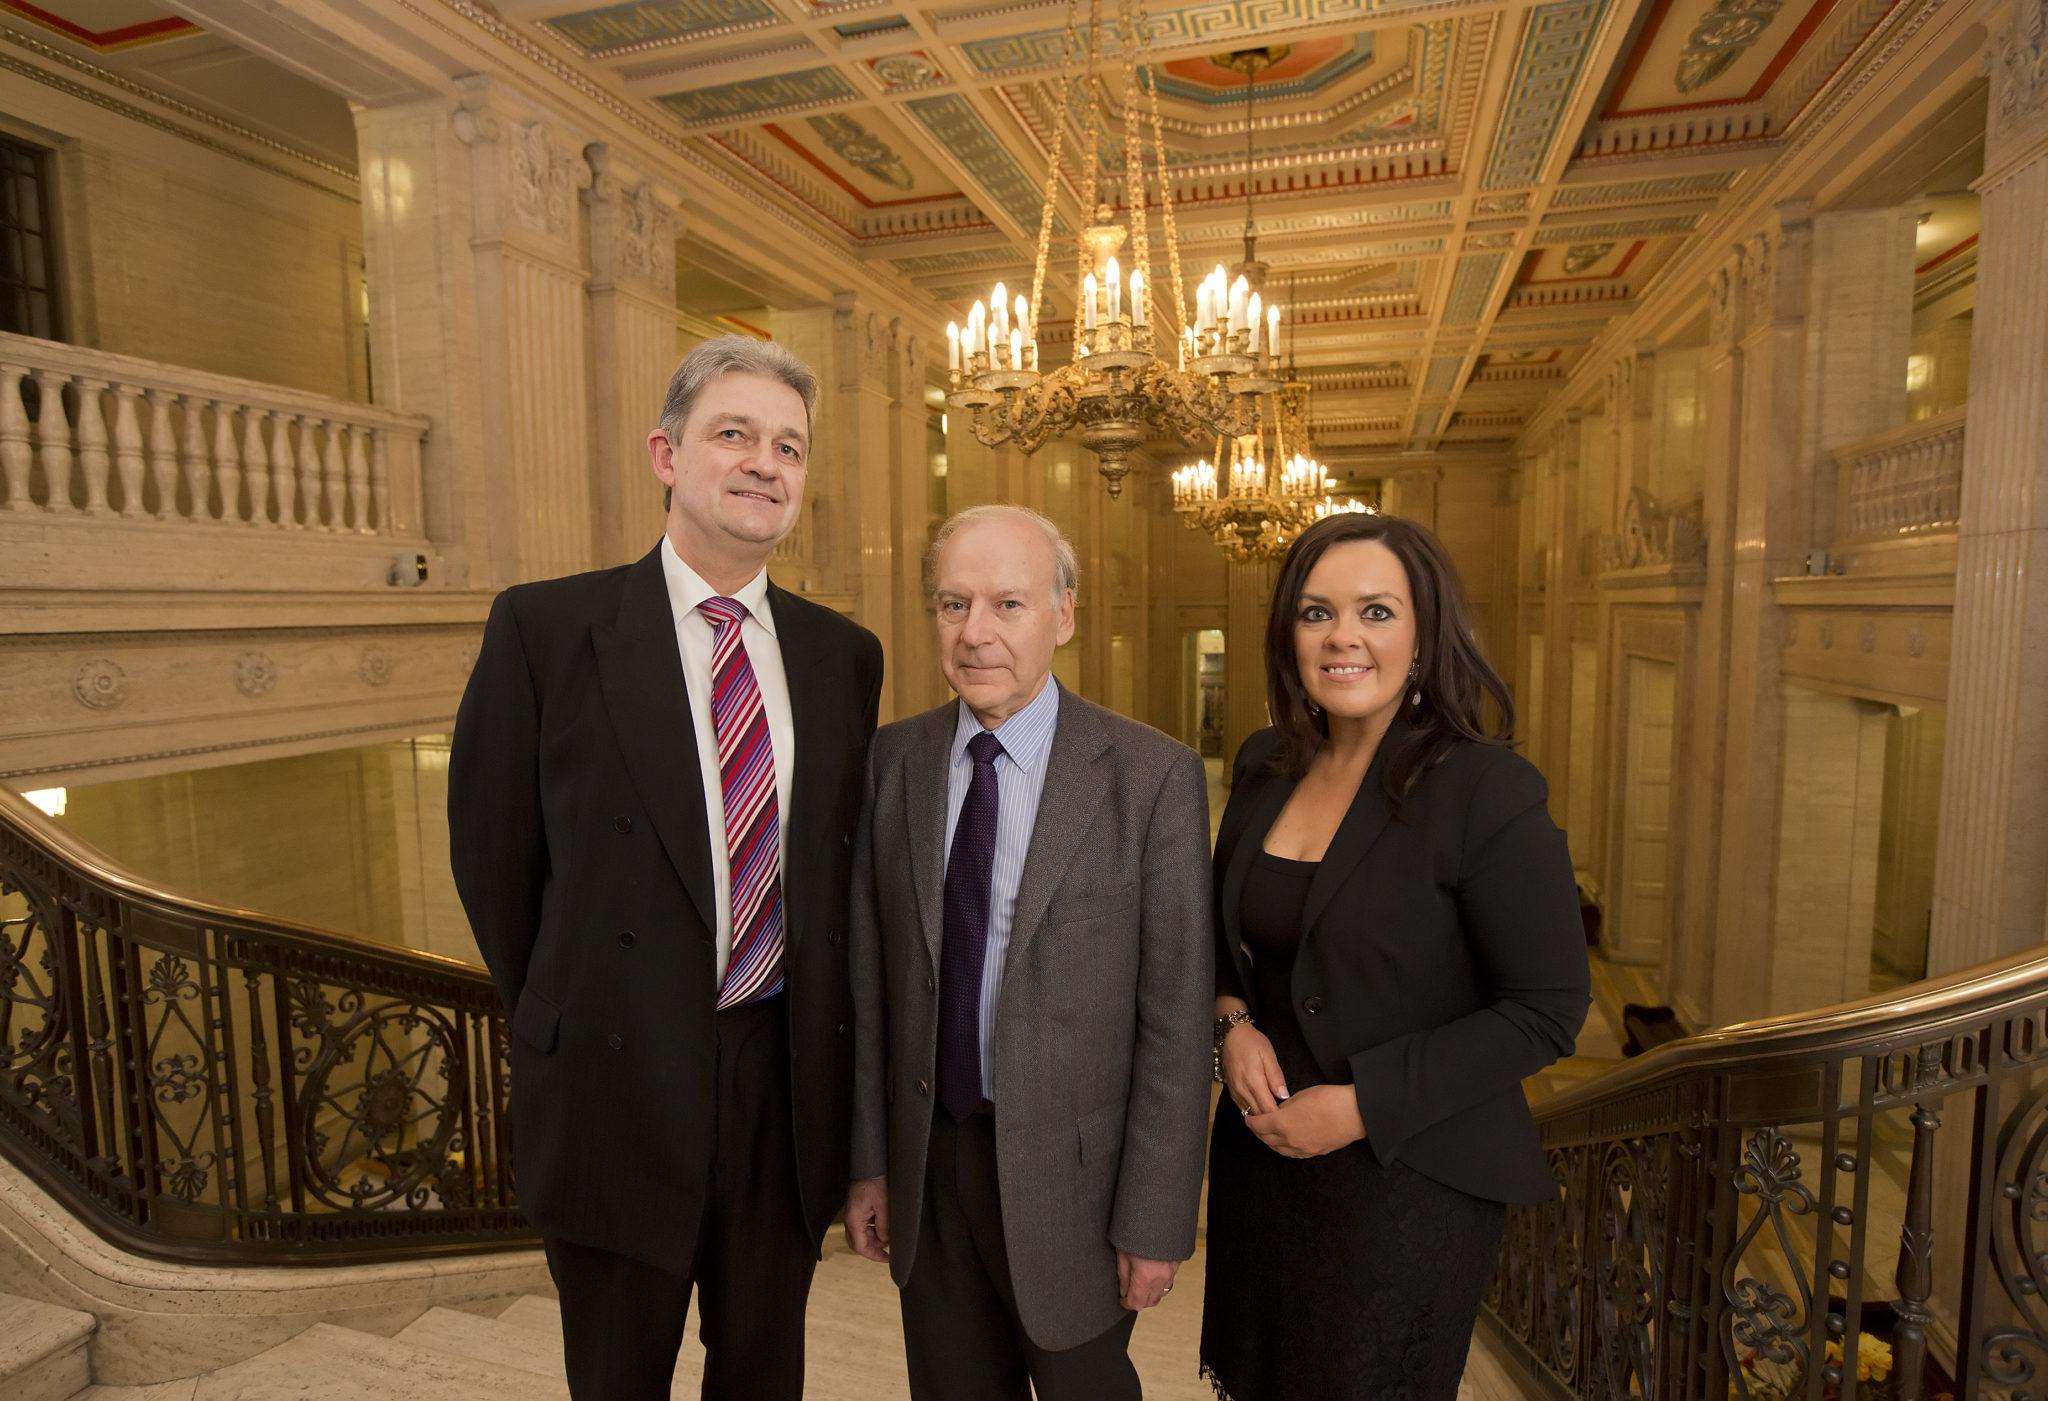 0353: Mr Justice Bernard McCloskey, Michel Puechavy, Fionnuala Connolly.